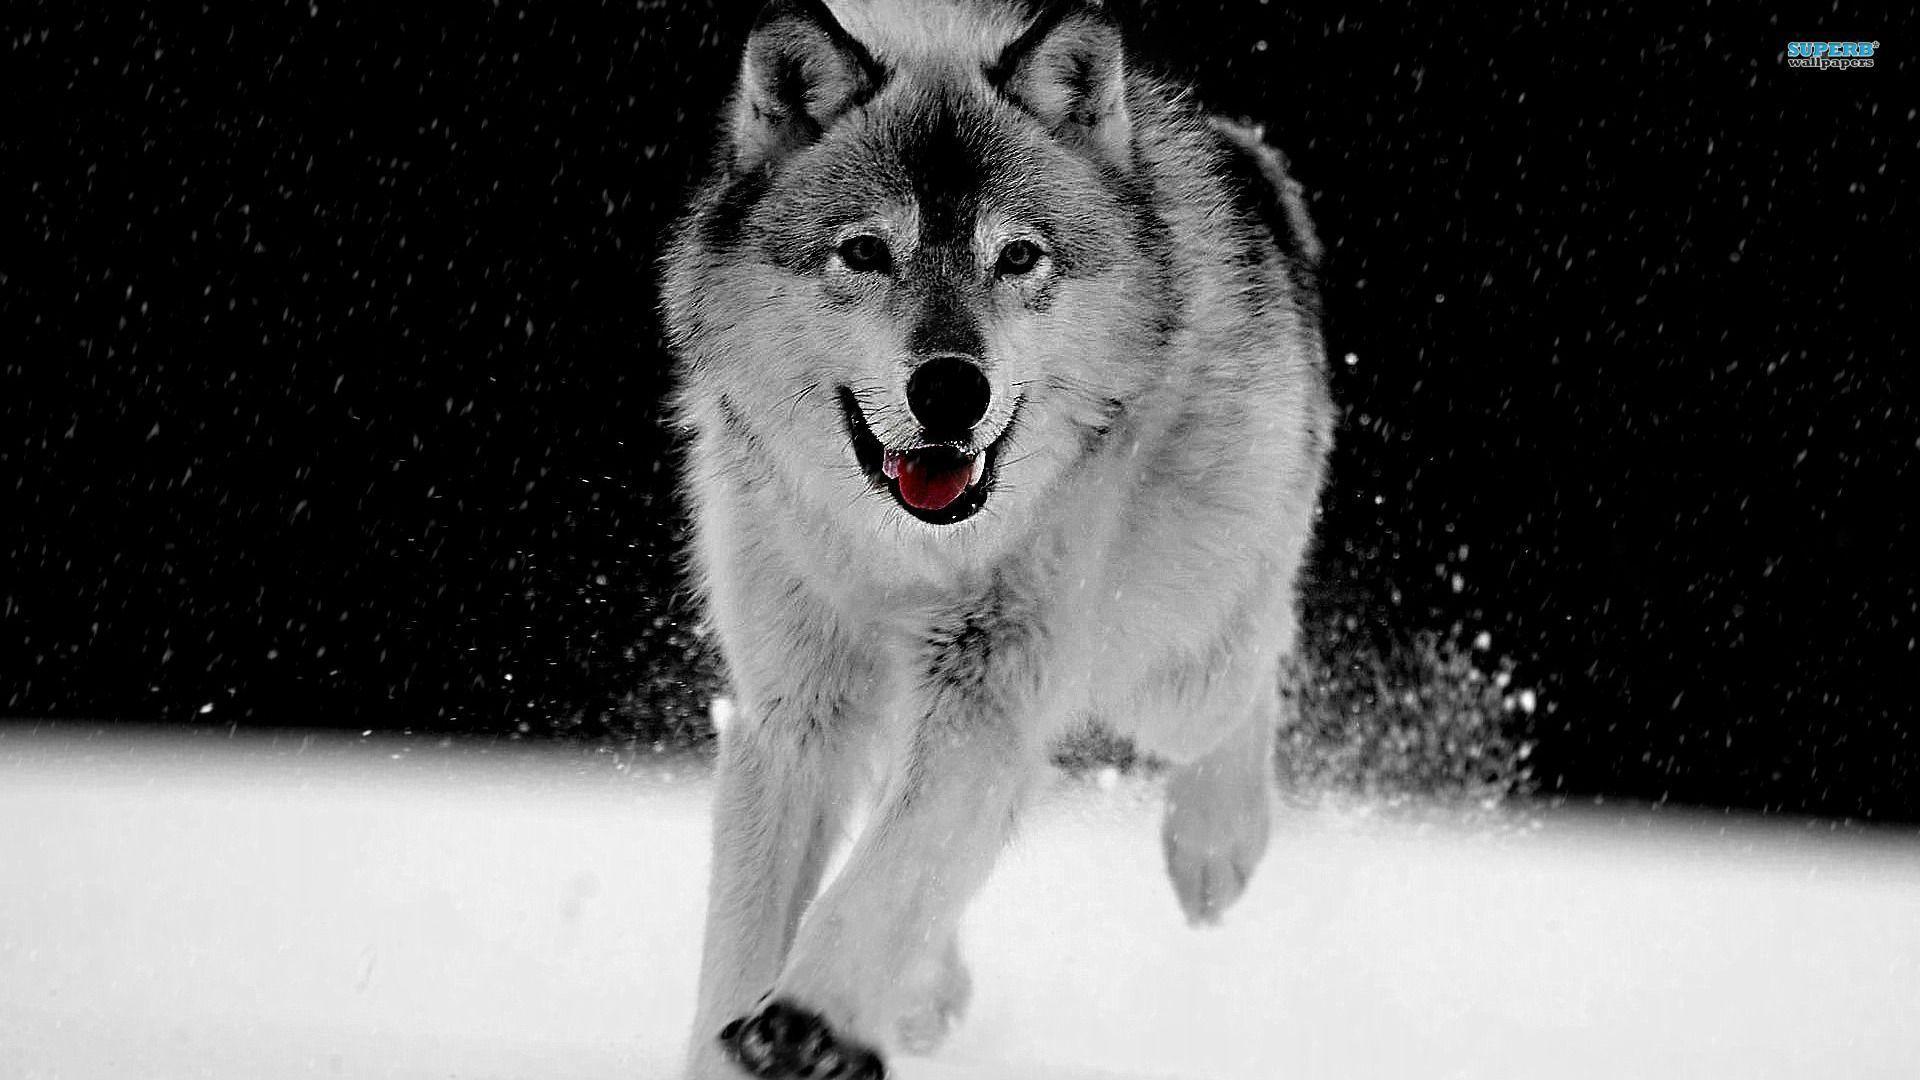 Wolf Desktop Wallpapers Top Free Wolf Desktop Backgrounds